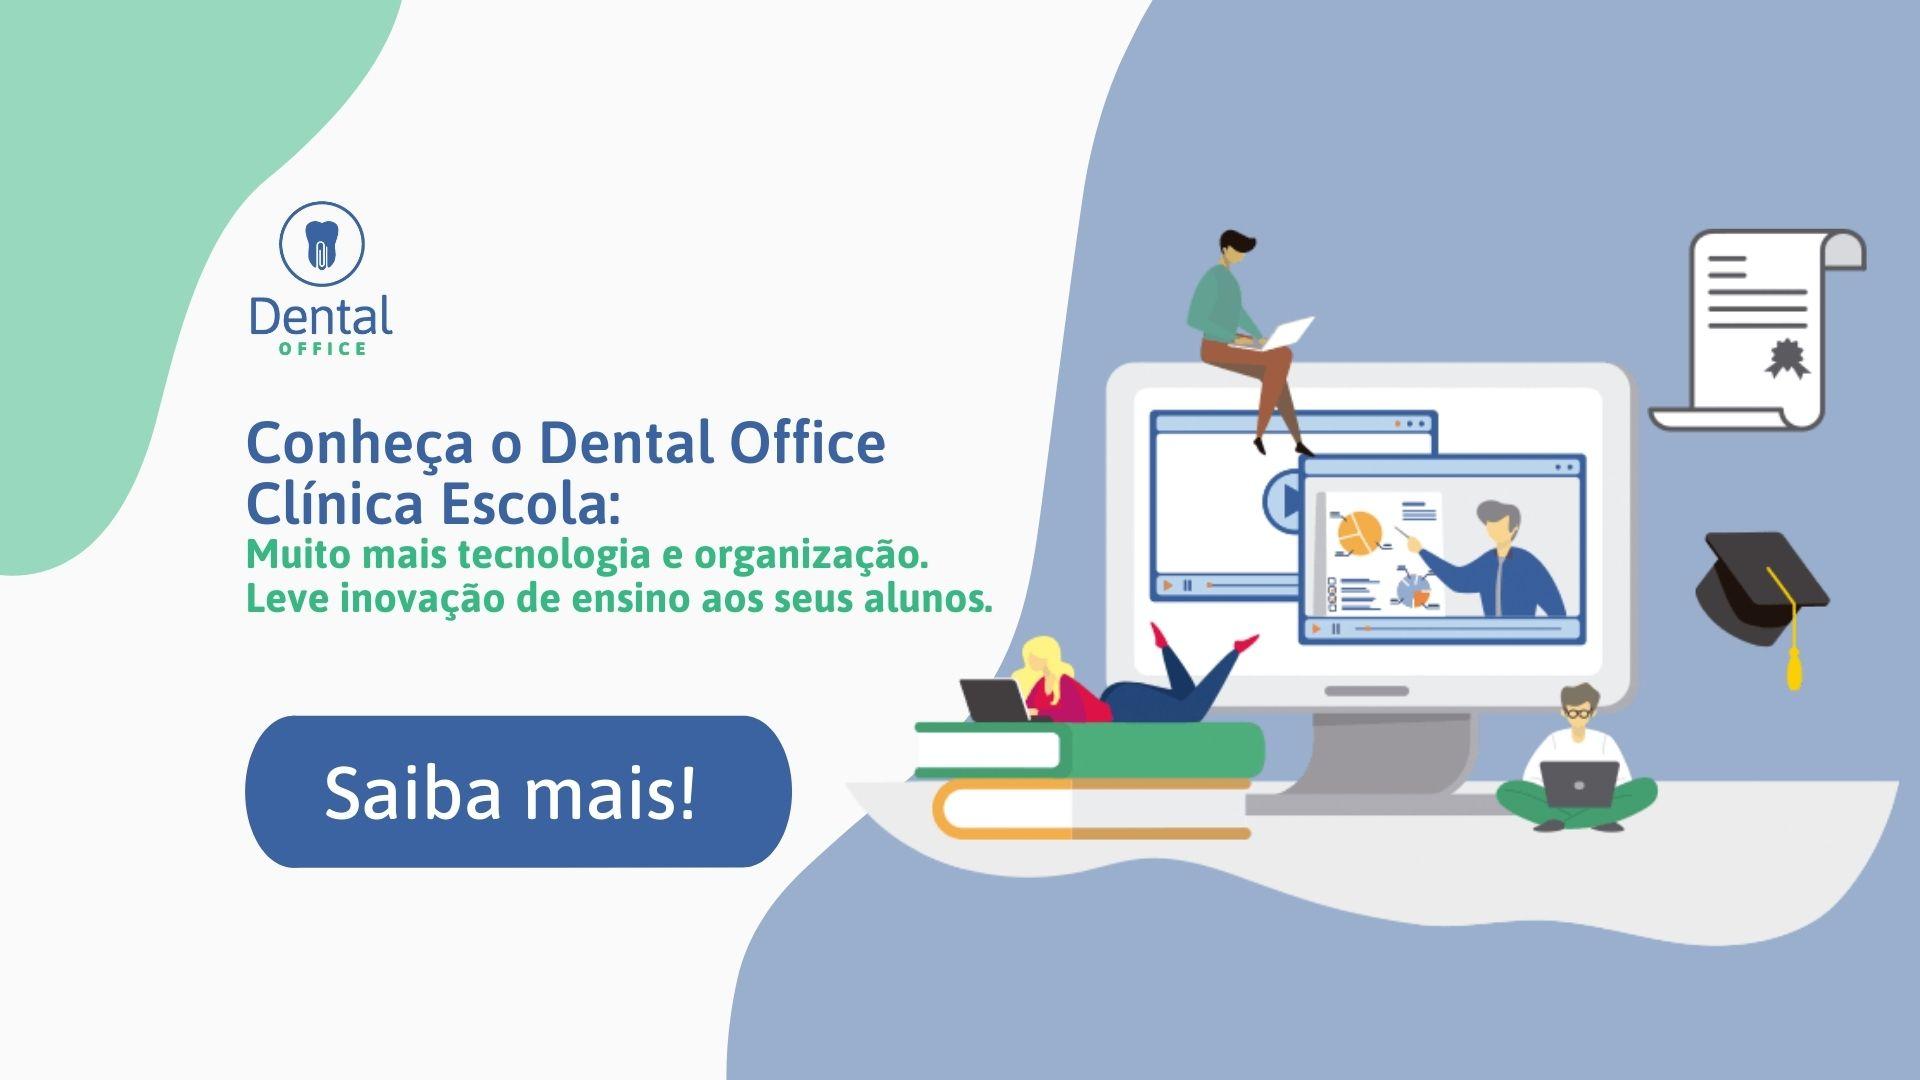 sistema para clínica escola de odontologia